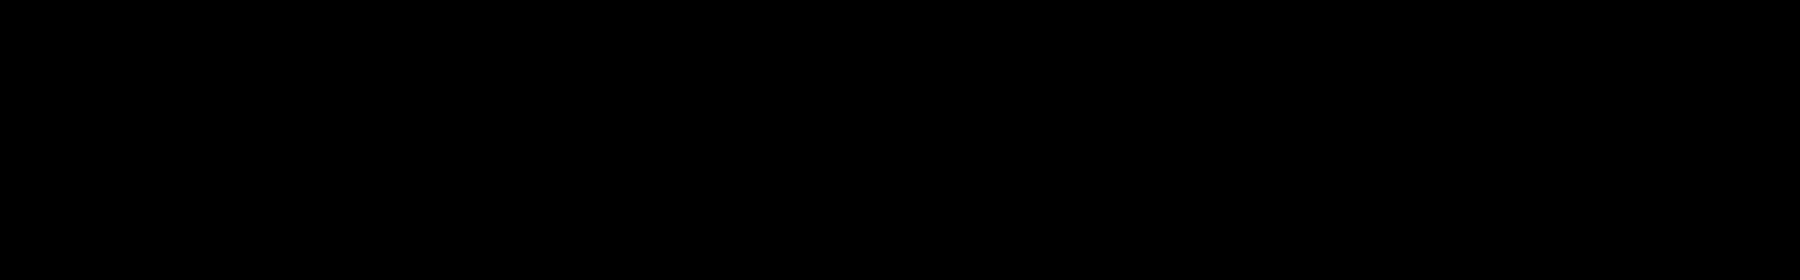 Deep Kontakt audio waveform